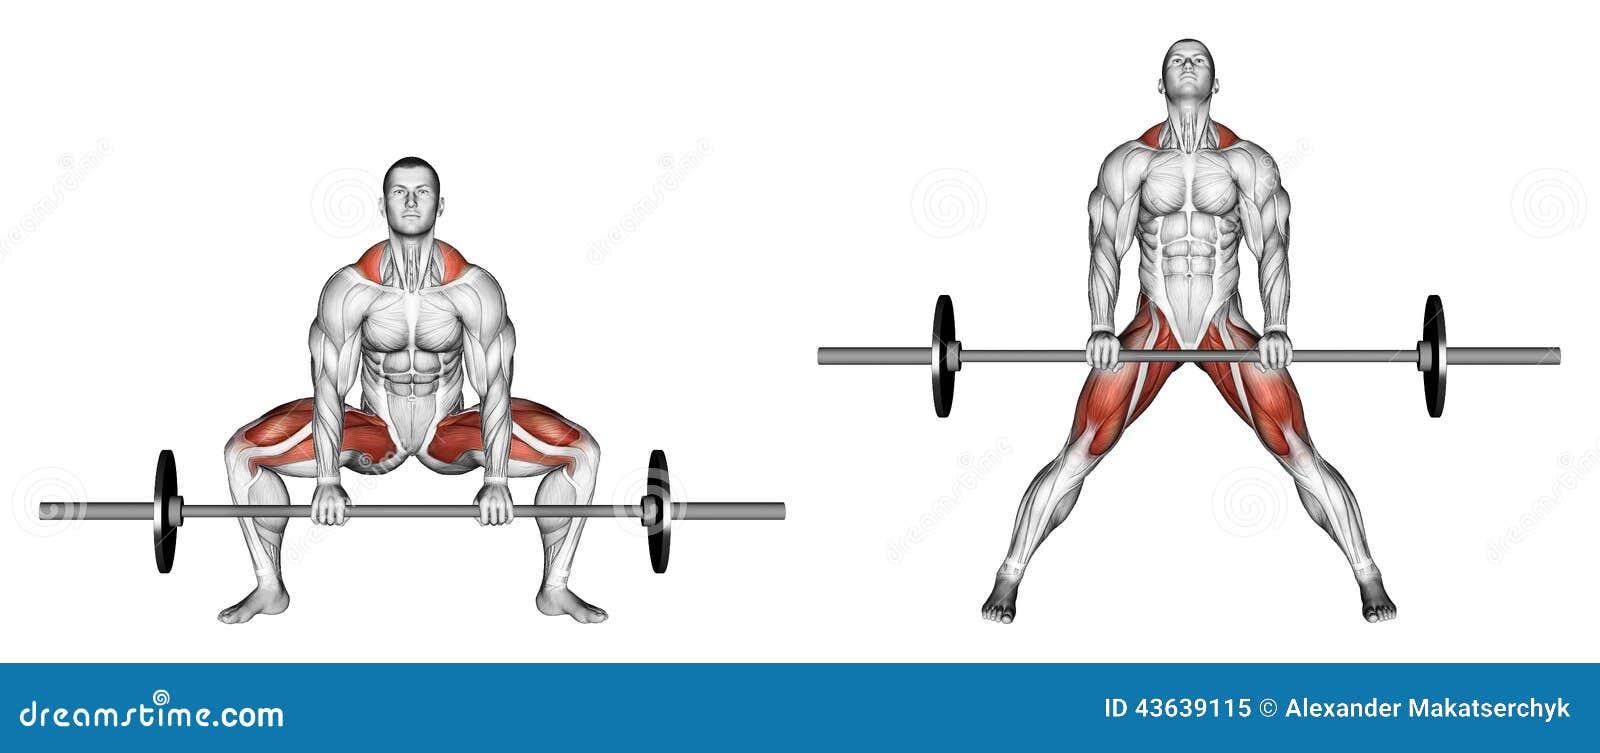 exercising deadlifts sumo stock illustration image